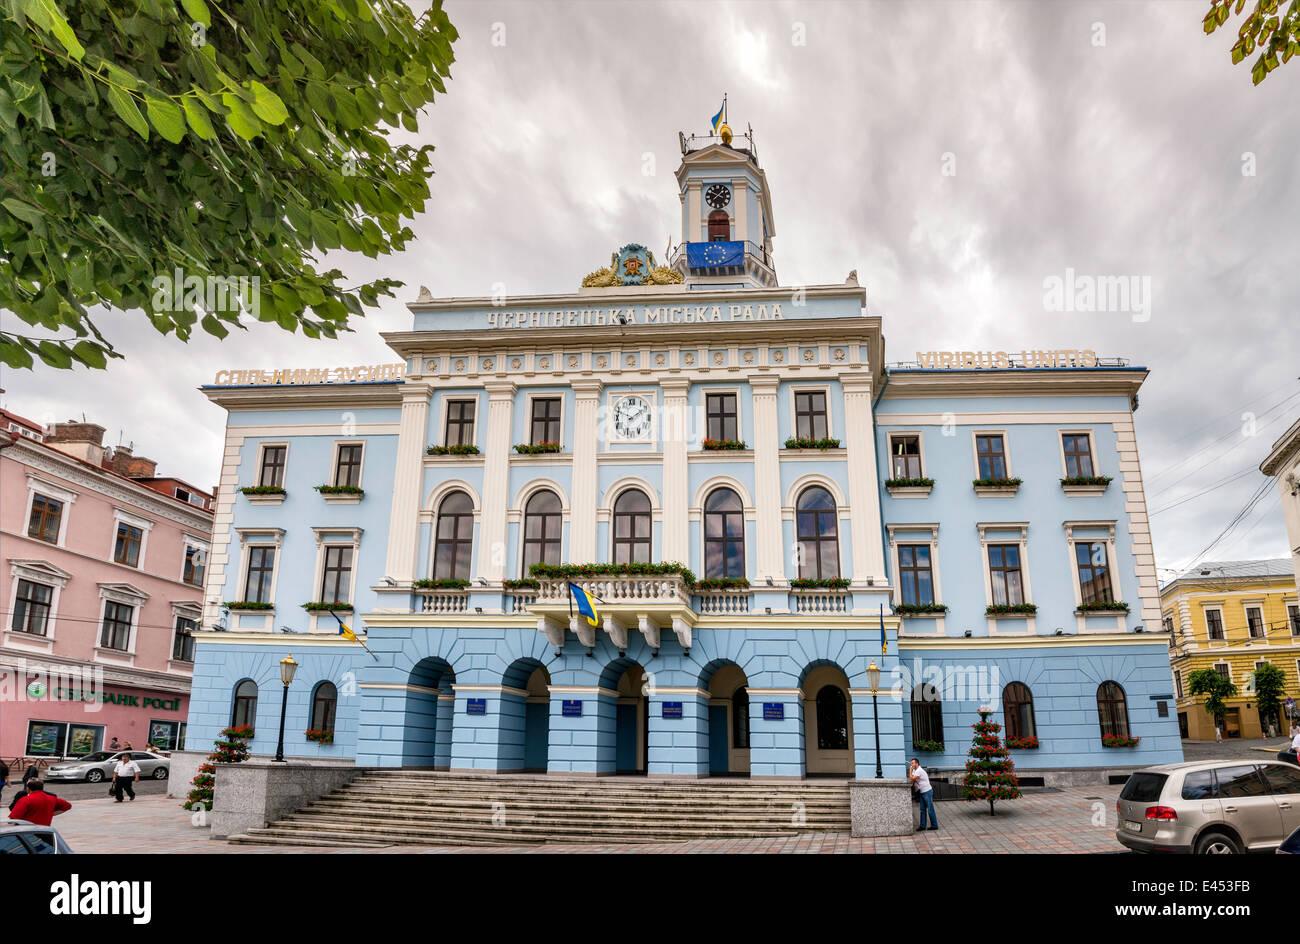 News of Chernivtsi region: a selection of sites